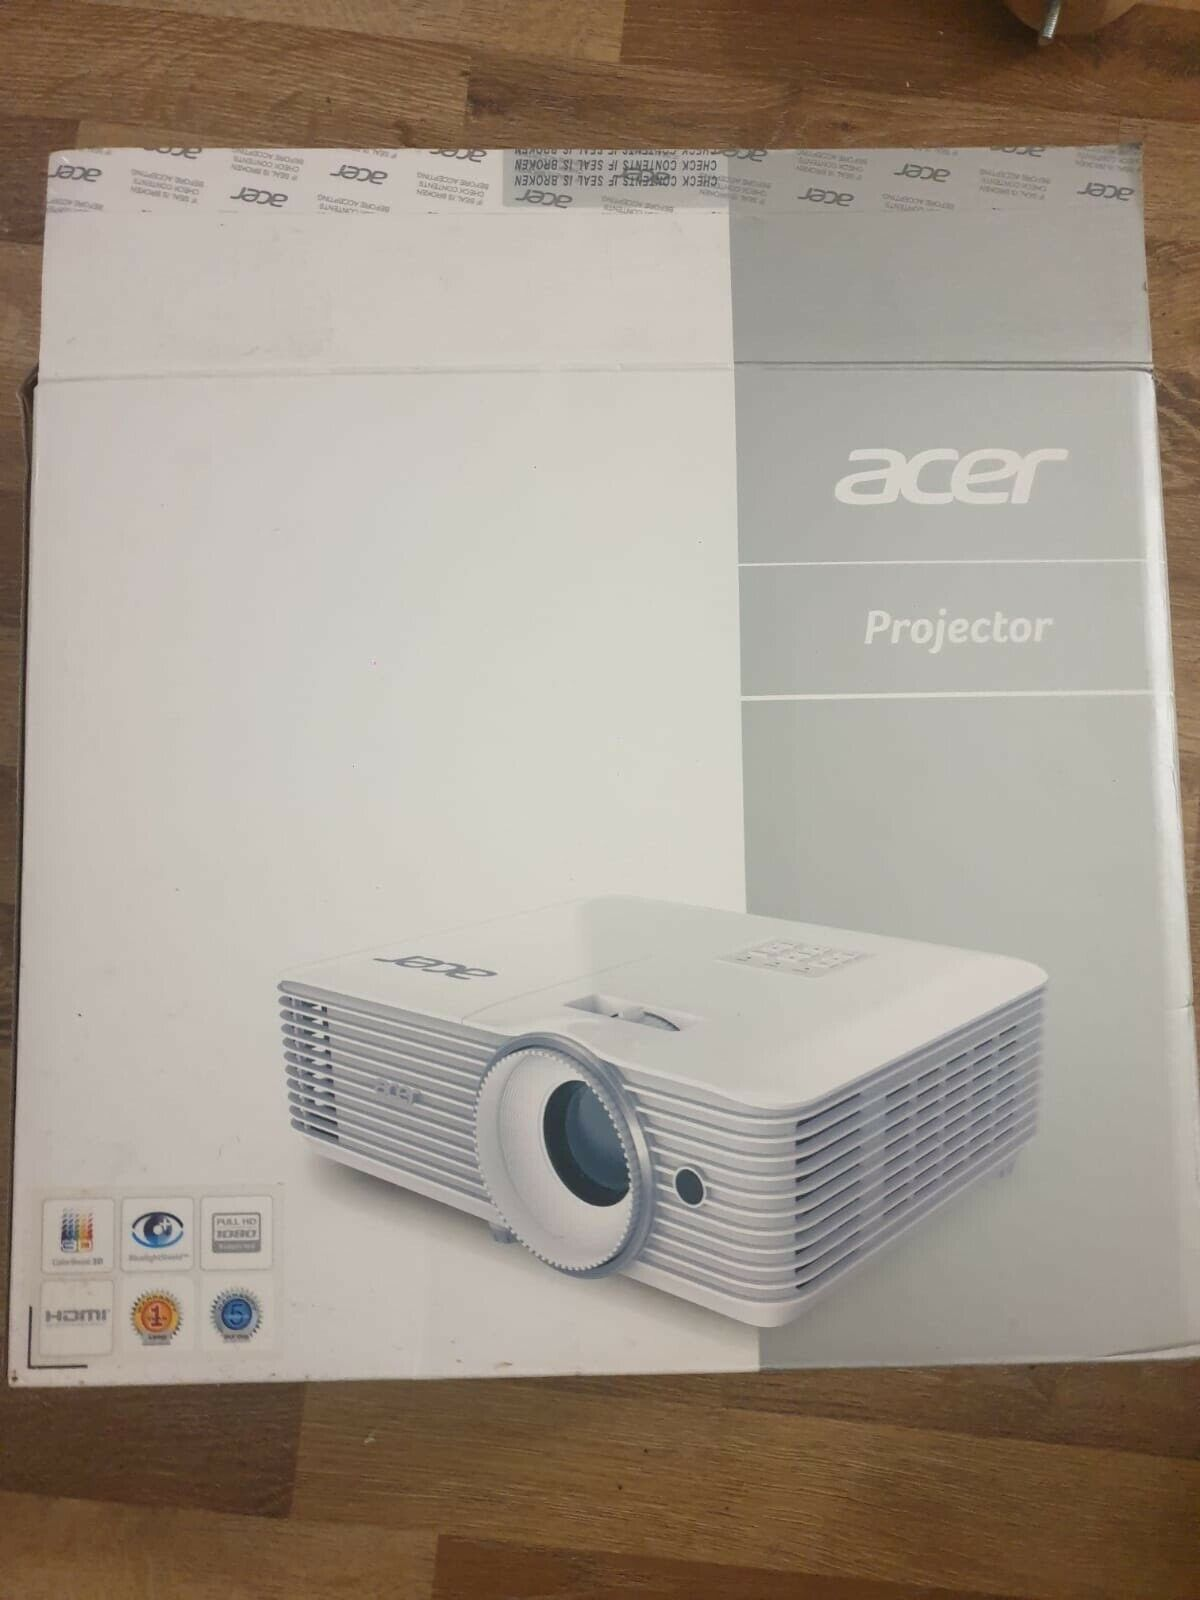 Vidéo projecteur acer gm512 blanc3500 lumens - full hd (1920 x 1080) - 16:9 - 1